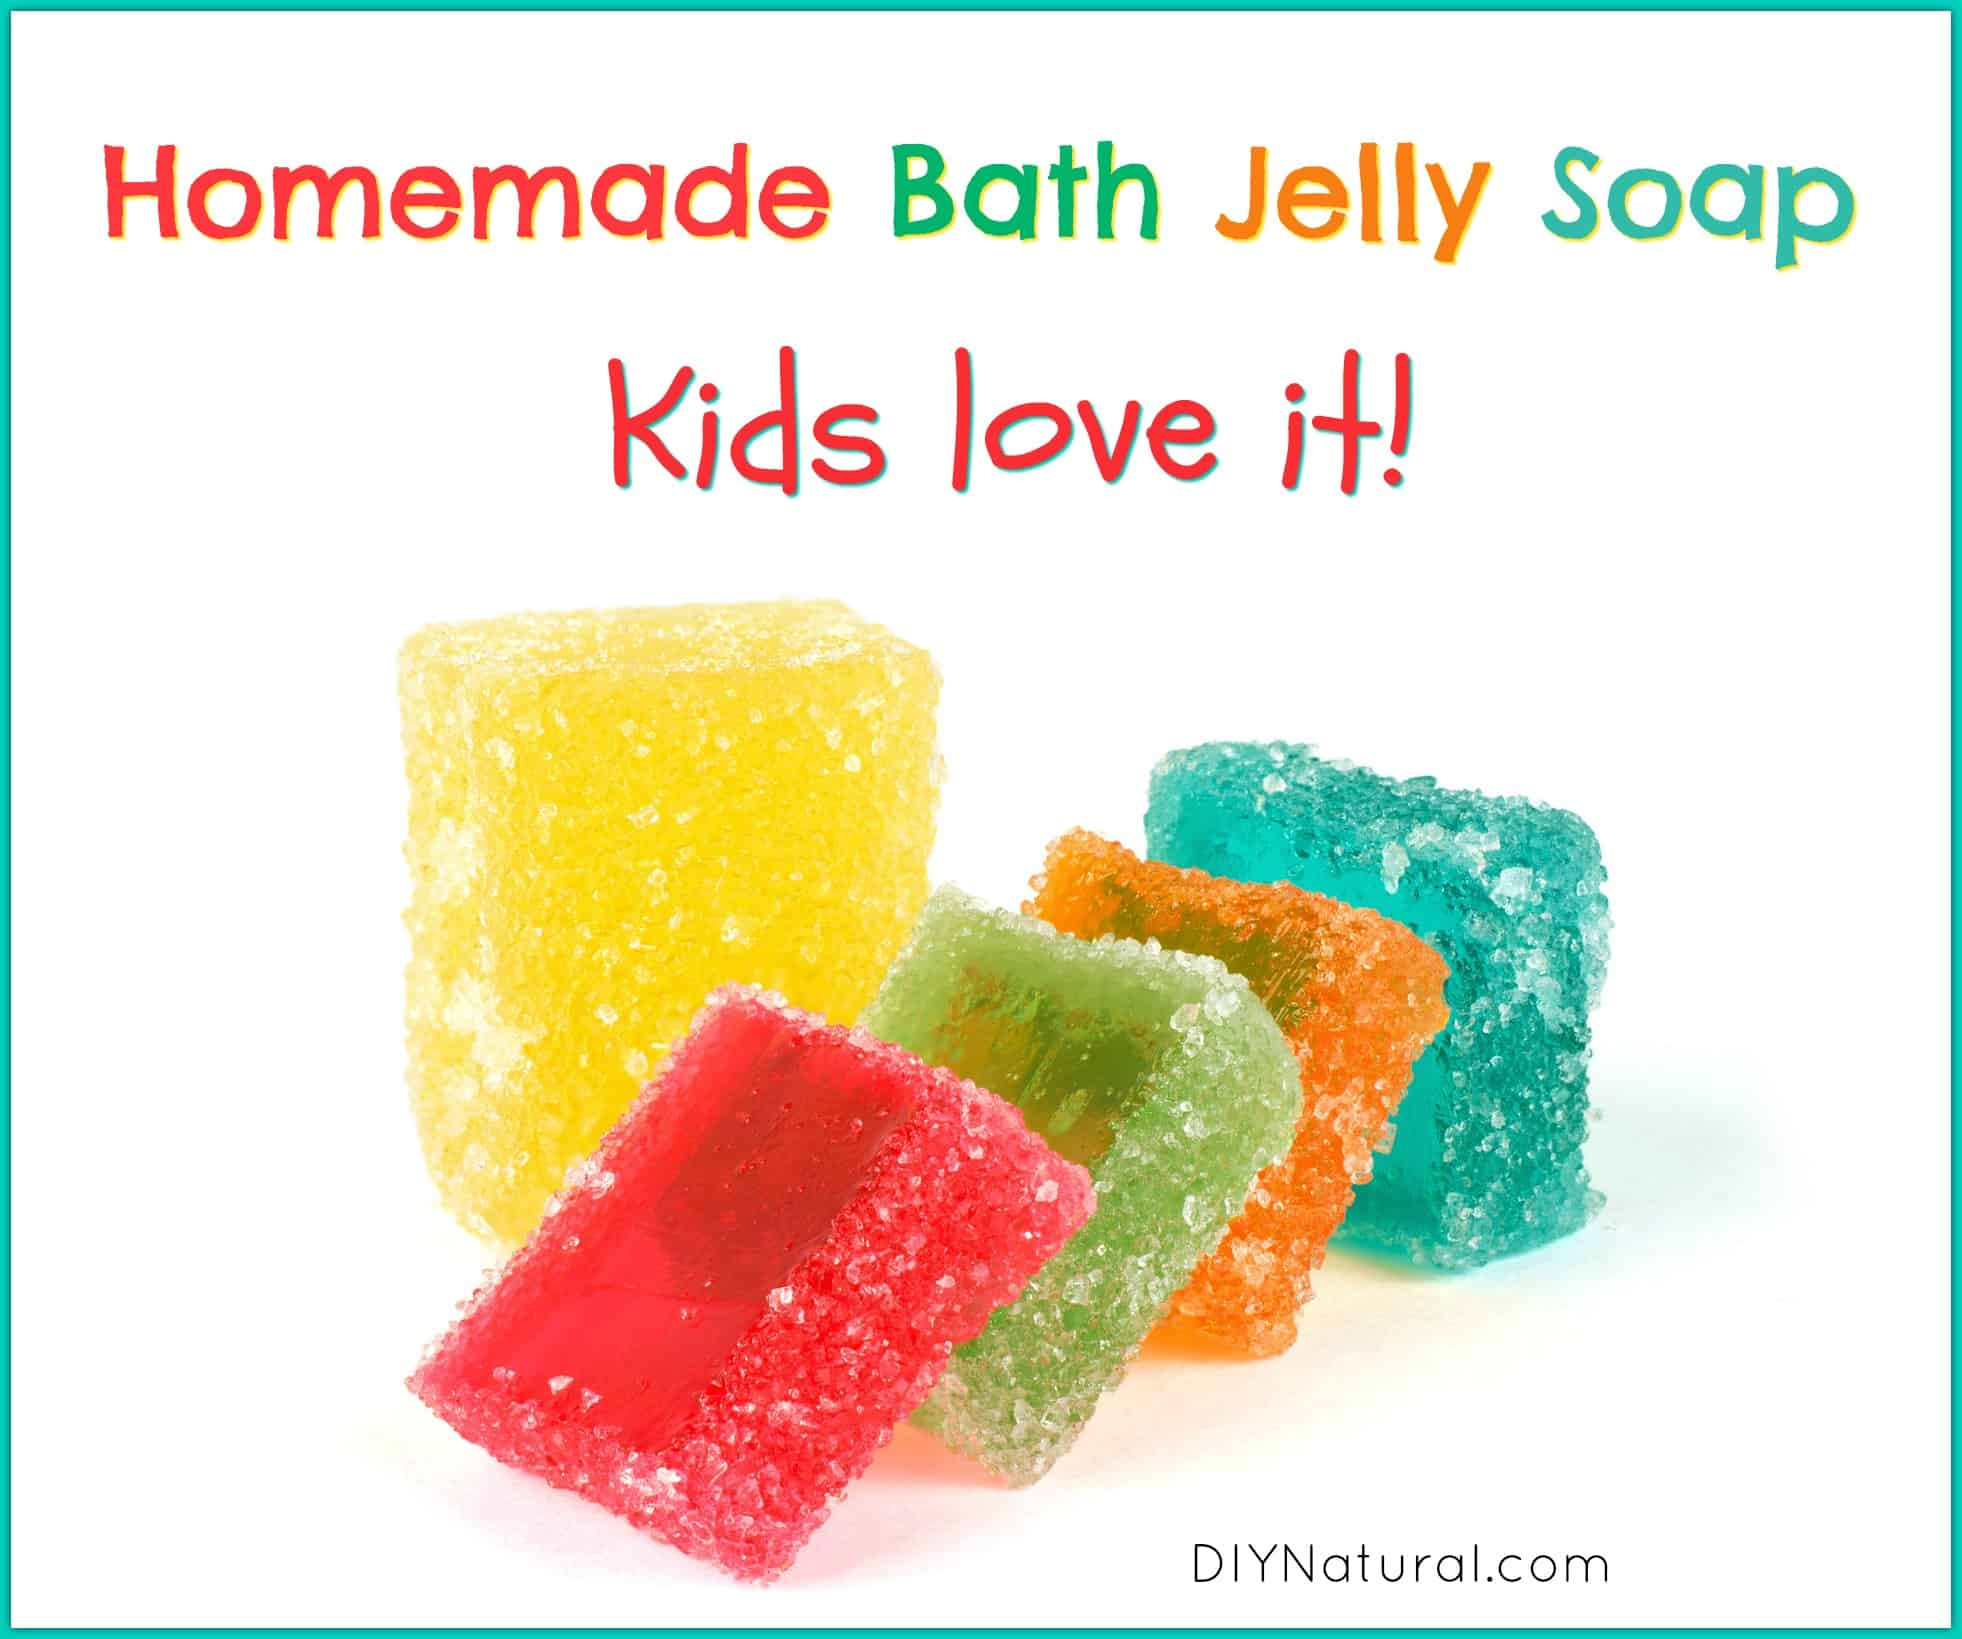 Fruity homemade bath jelly soap for kids